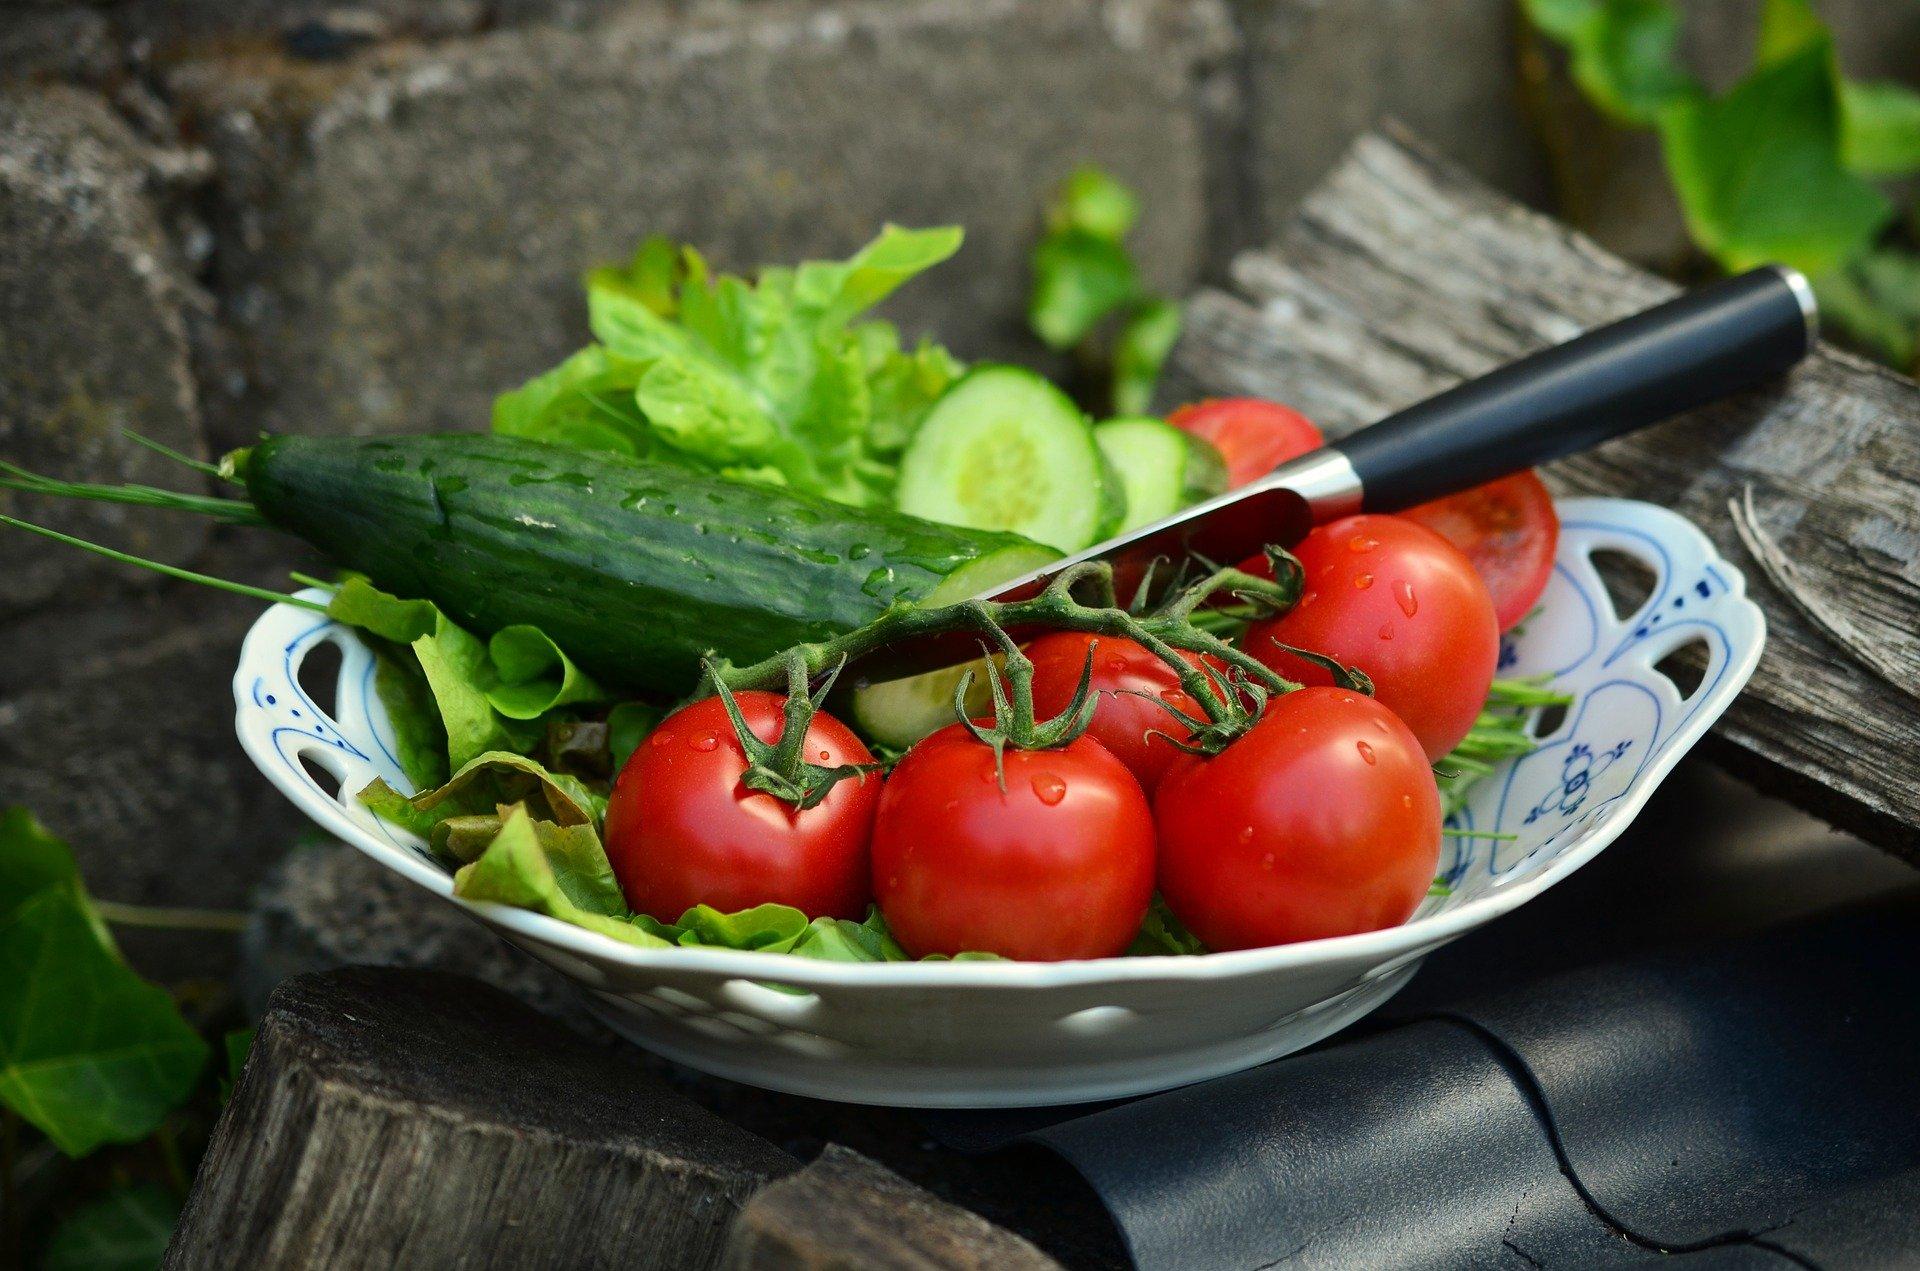 Новые, картинки с огурцами и помидорами